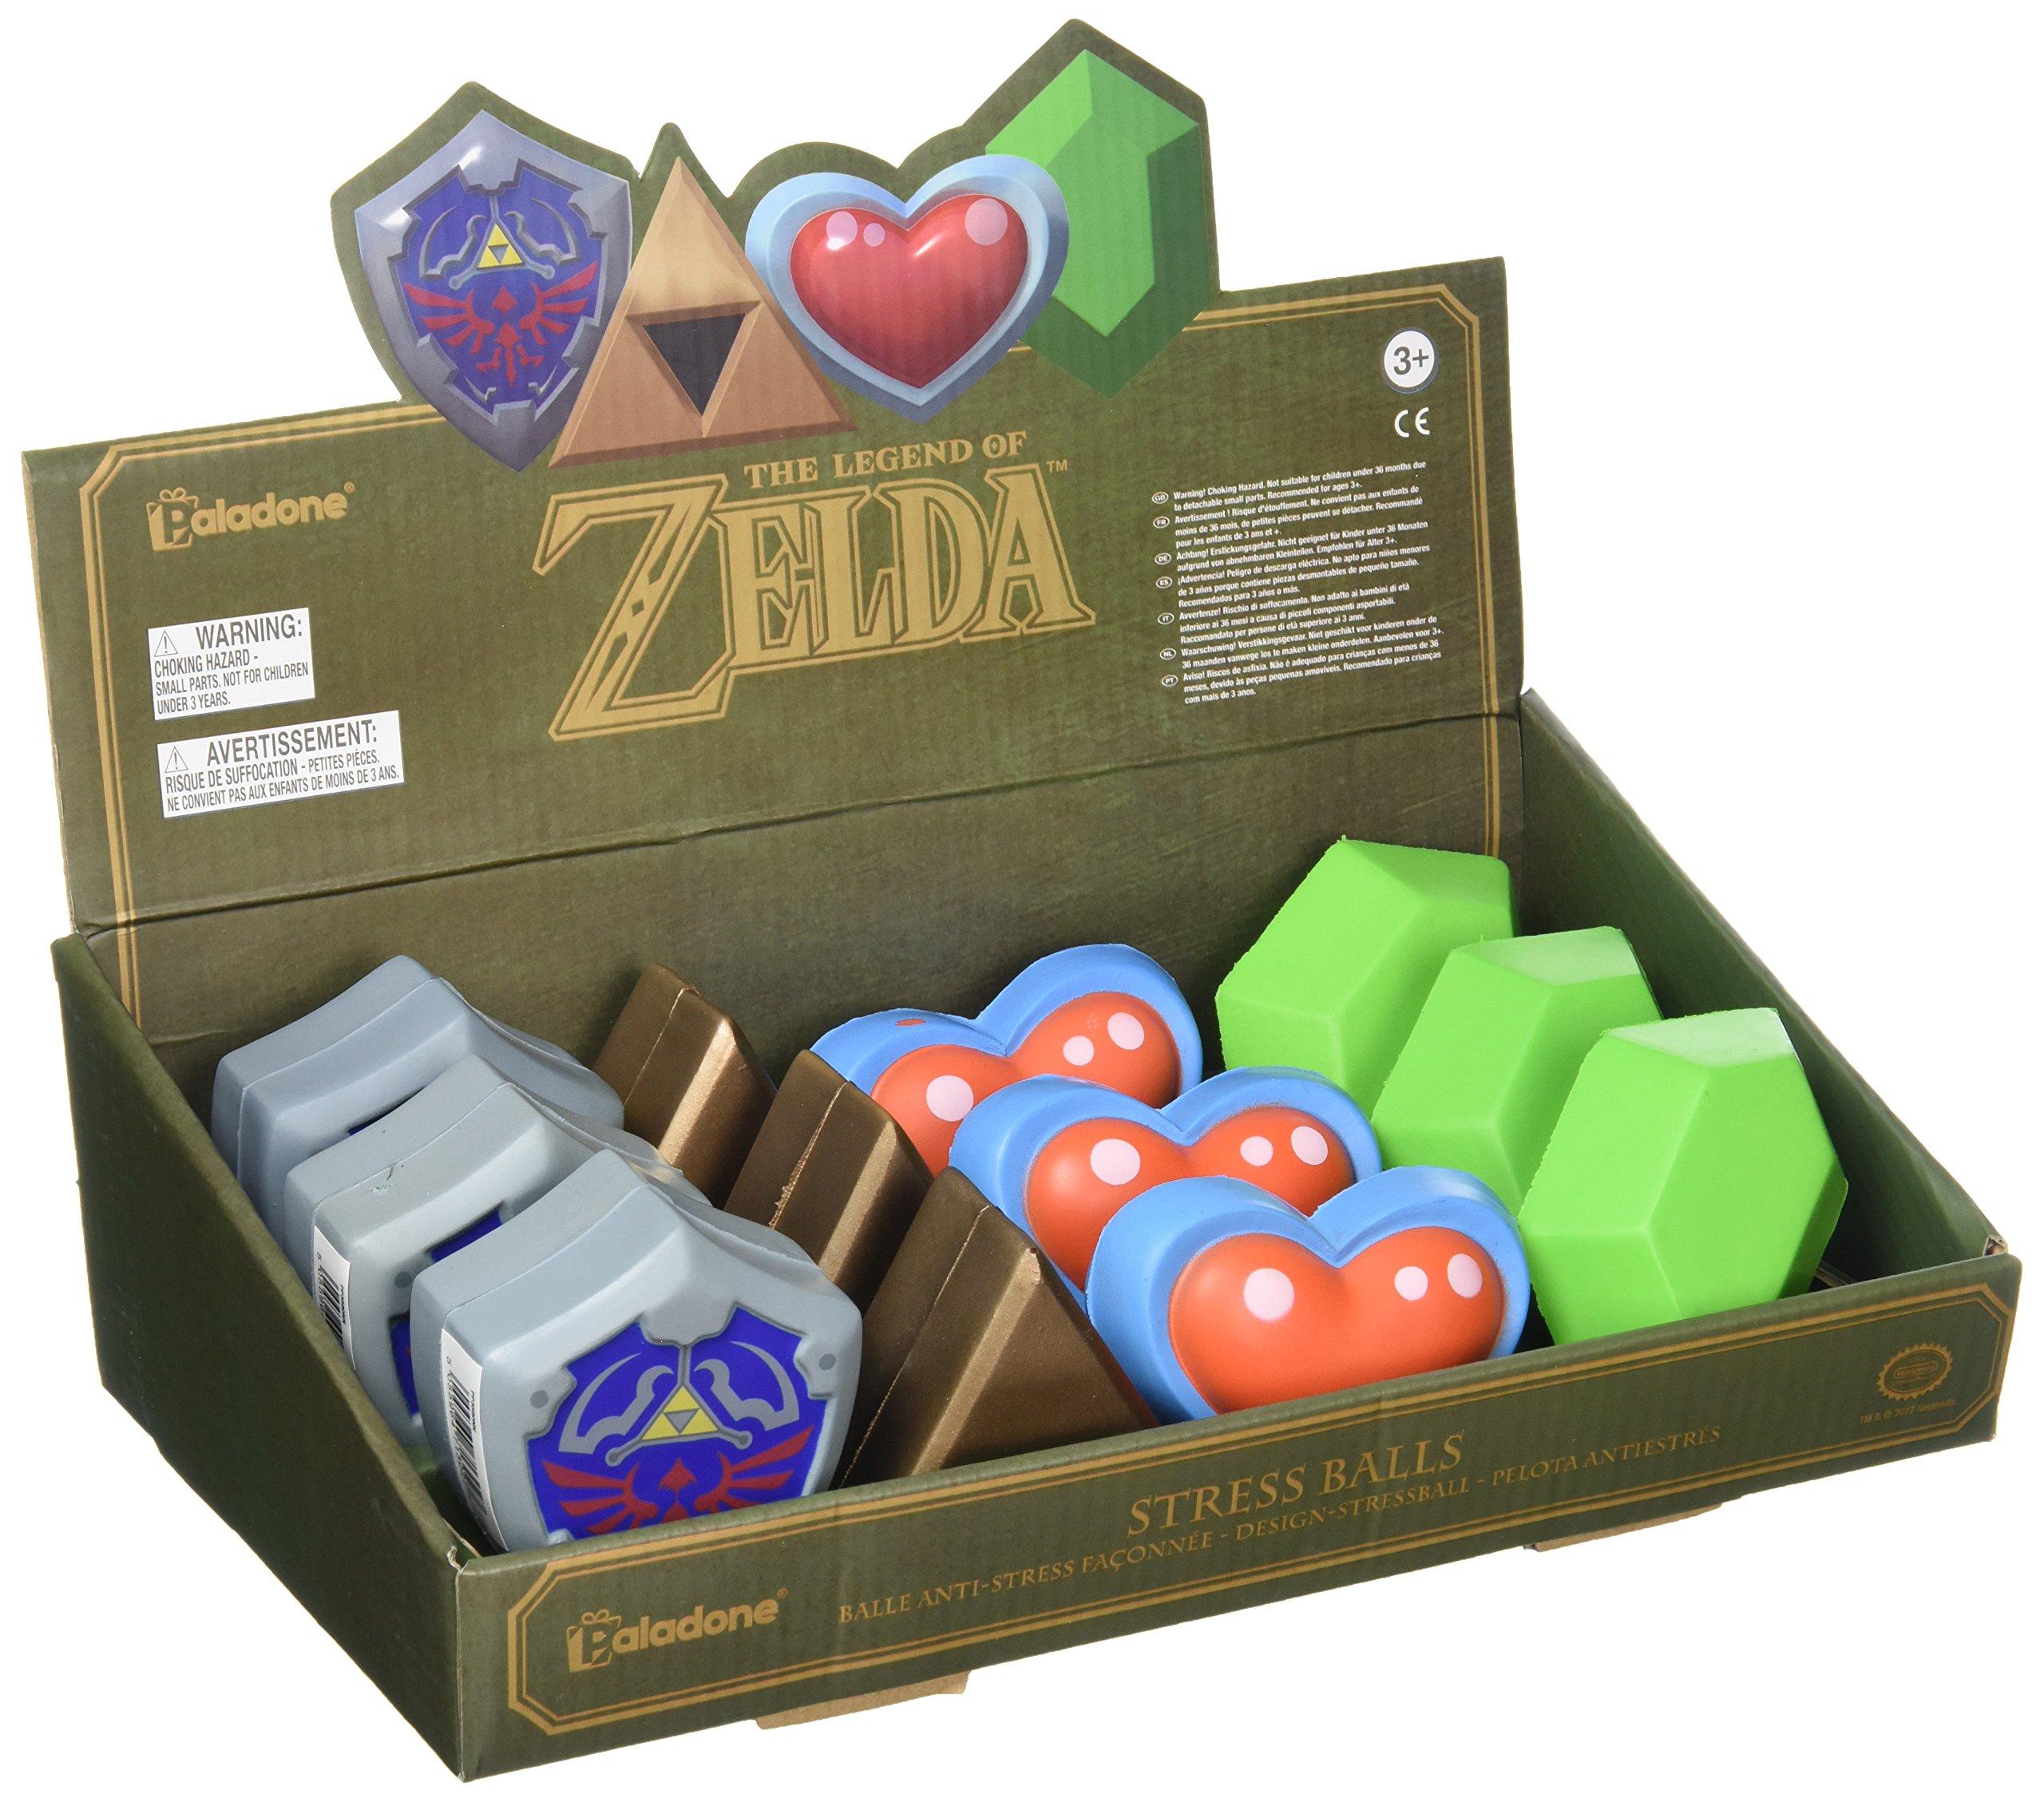 Legend of Zelda 3D Stress Balls, 12 Pack